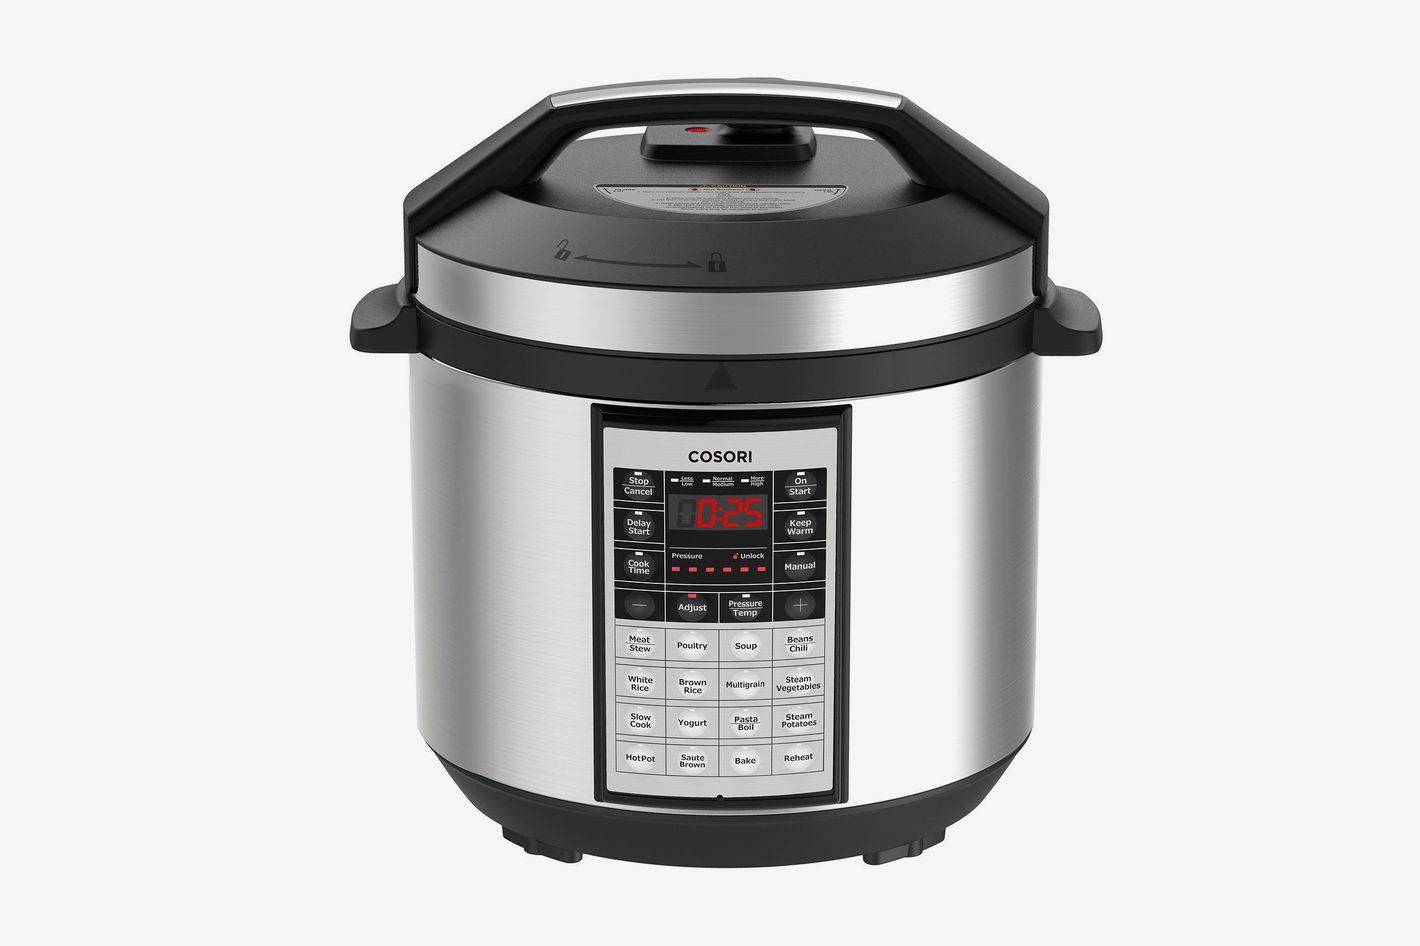 Cosori 6 Quart 8-in-1 Multi-Functional Programmable Pressure Cooker